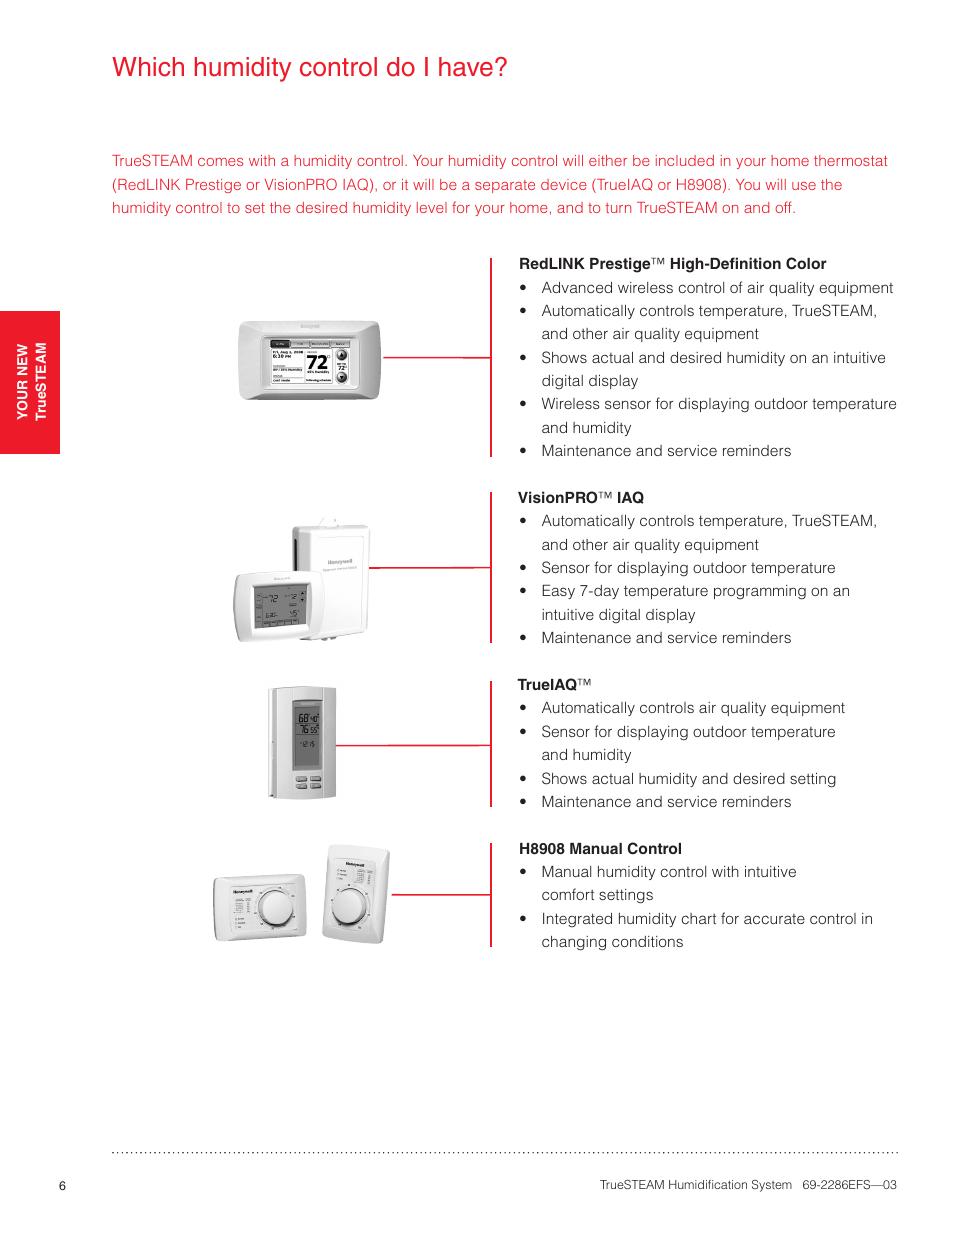 Honeywell Truesteam Manual Humidifier Wiring Diagram Installation Manua